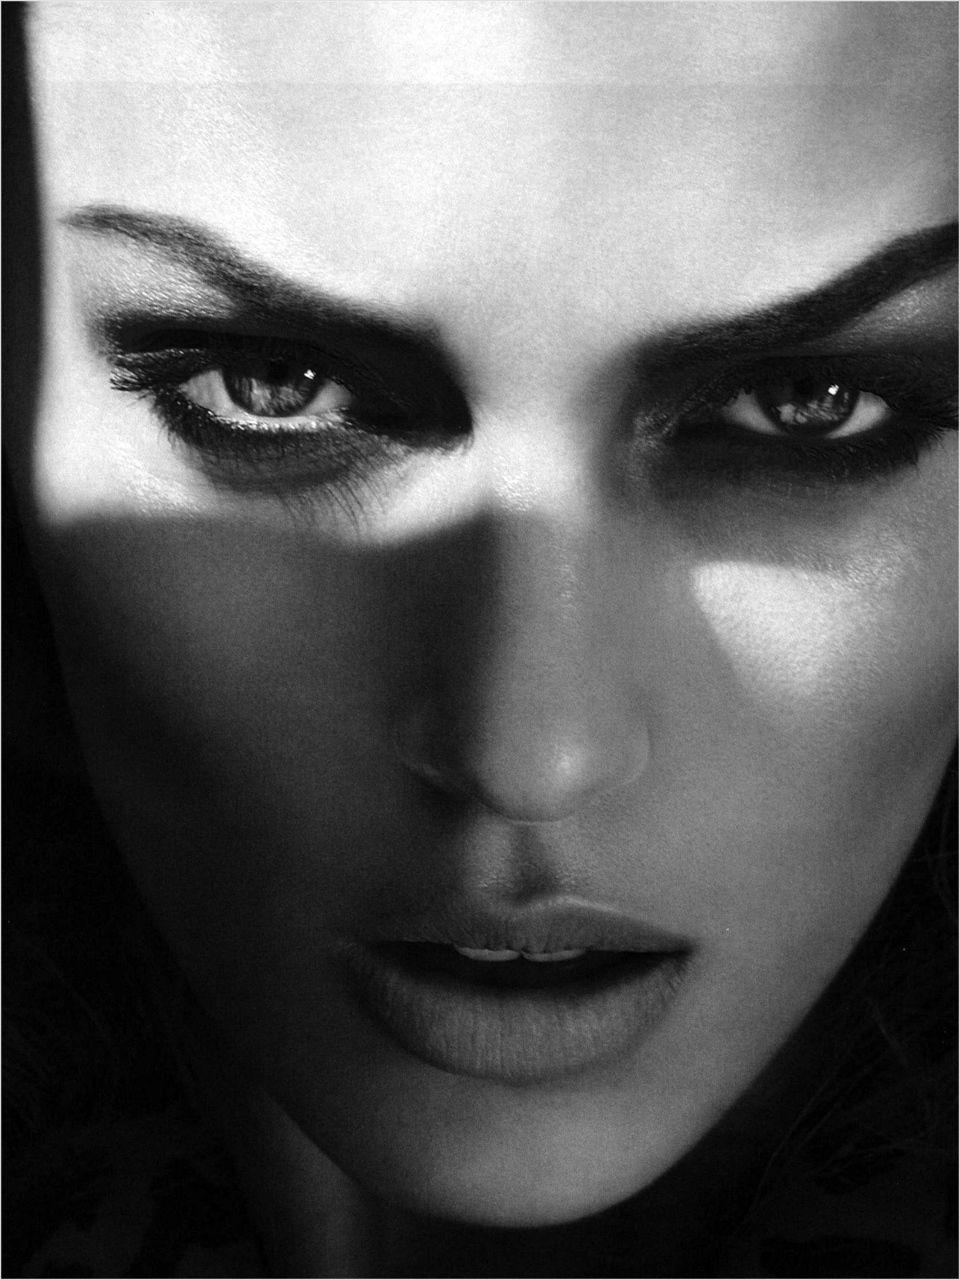 Dark Black Shadow Photography Beautiful Amazing Strong Free Deep Www Republicofyou Com Au Anja Rubik Fashion Shadow Photography